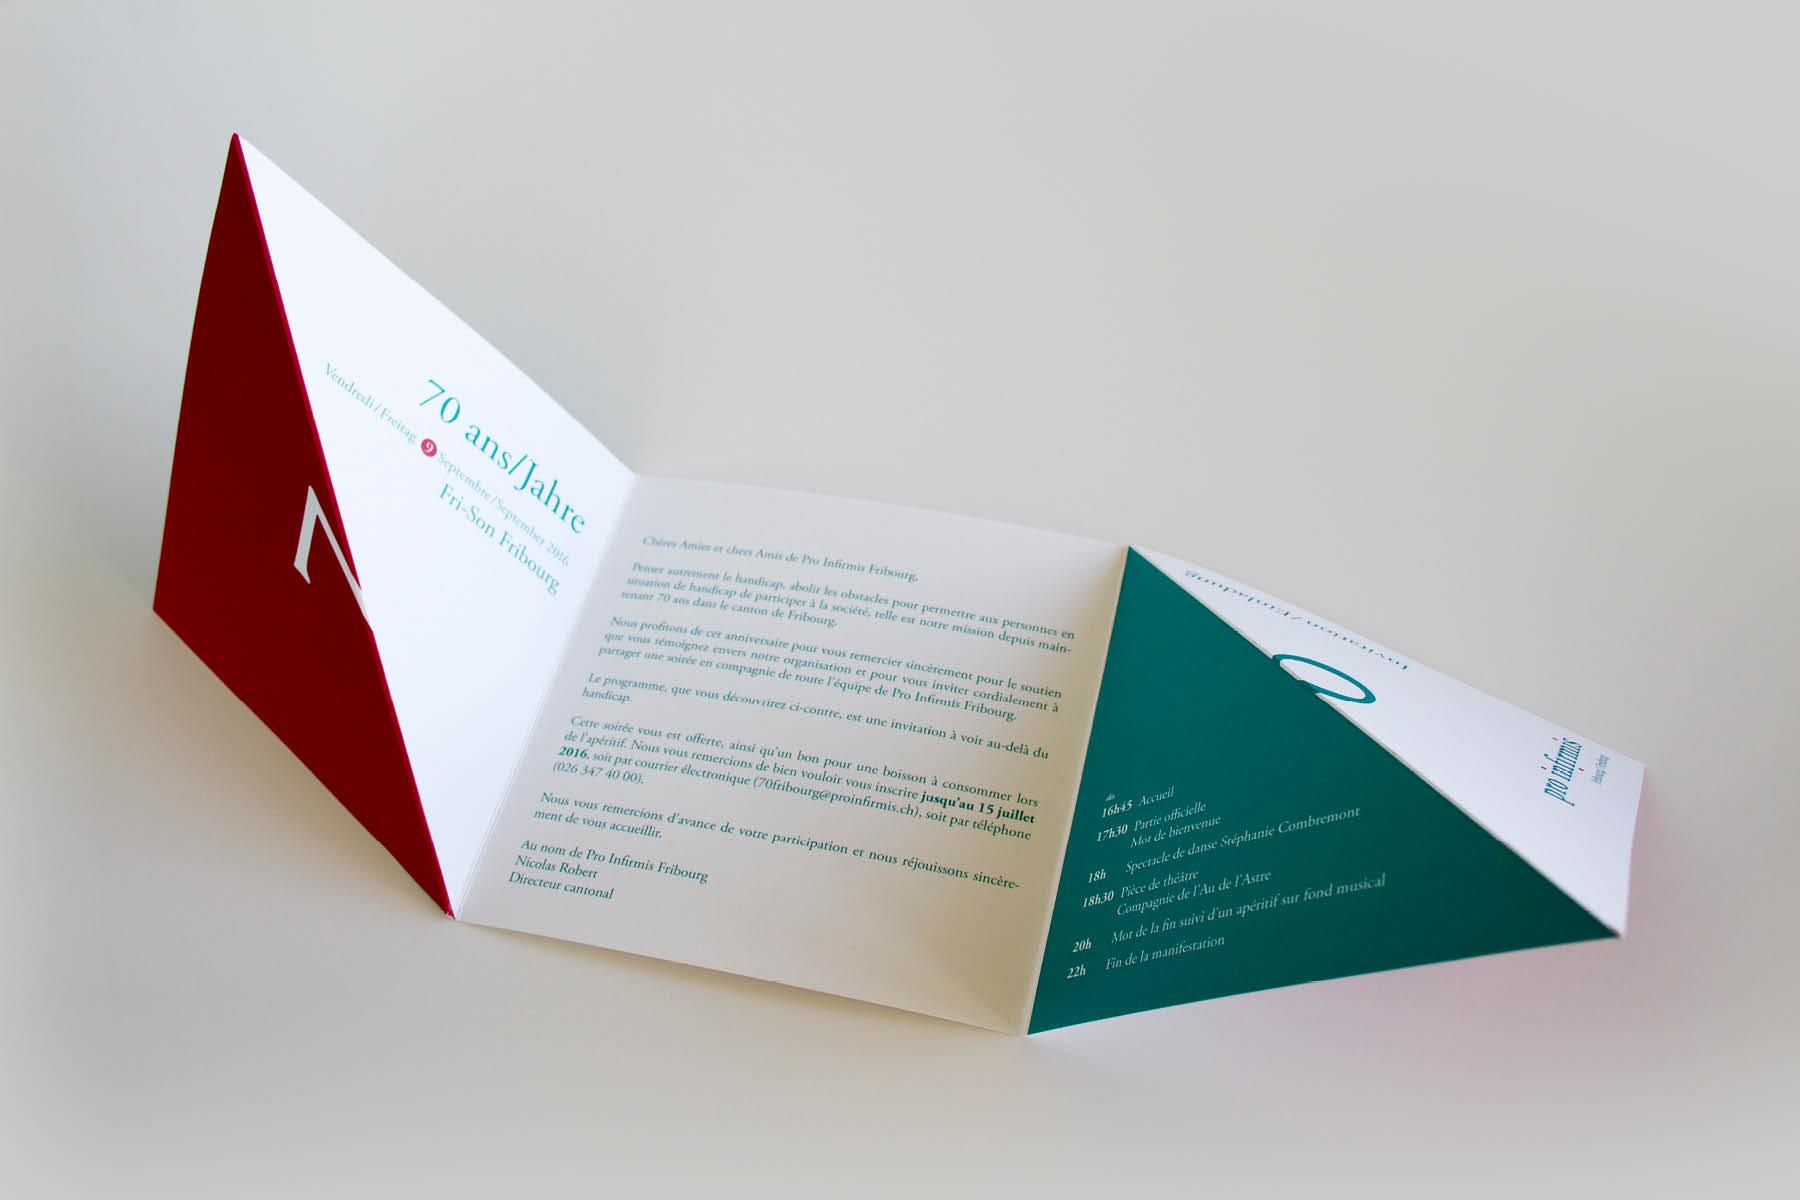 proinfirmis-invitation-origami